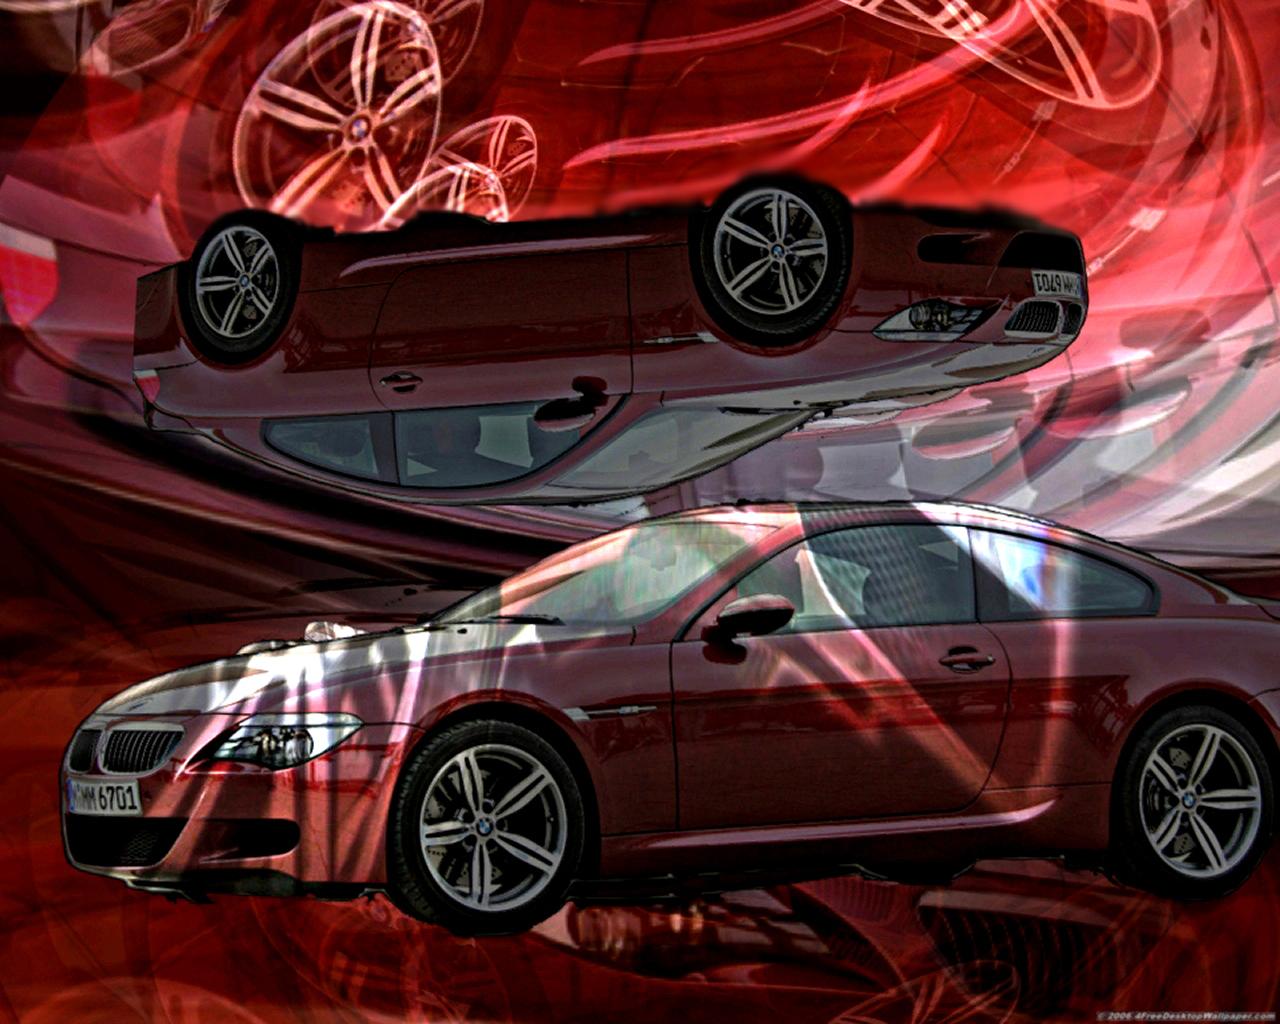 Download Bmw Car Wallpaper For Desktop Its My Car Club 1280x1024